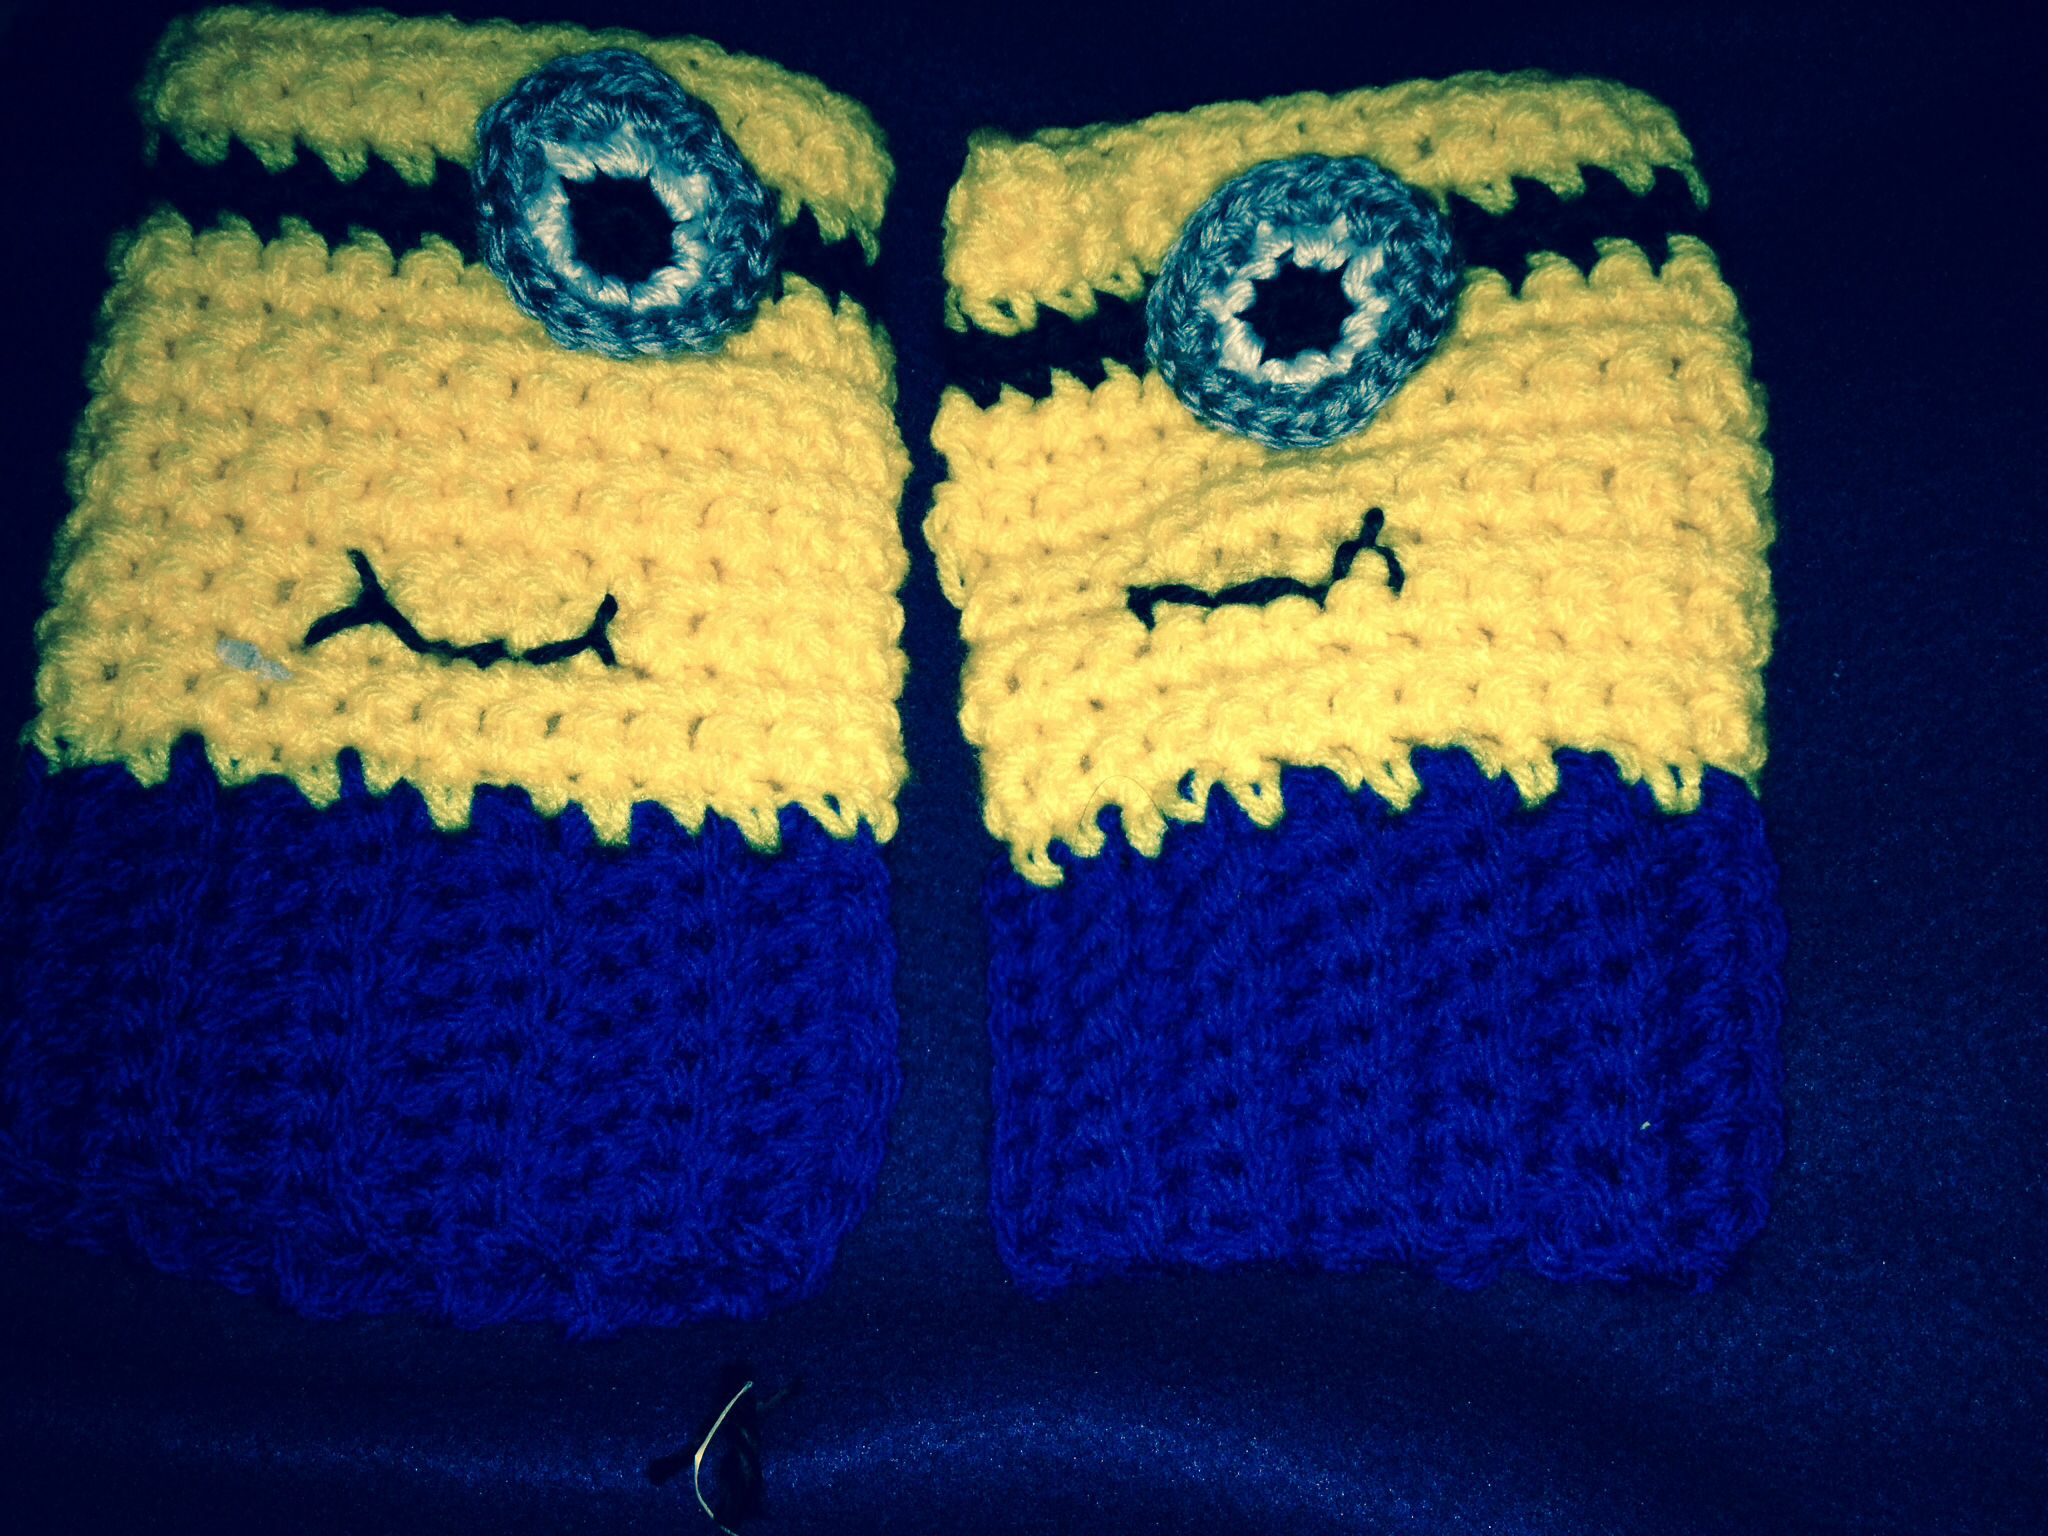 Free Crochet Pattern Minion Mitts : Minion Crochet Pattern Fingerless Gloves Car Interior Design